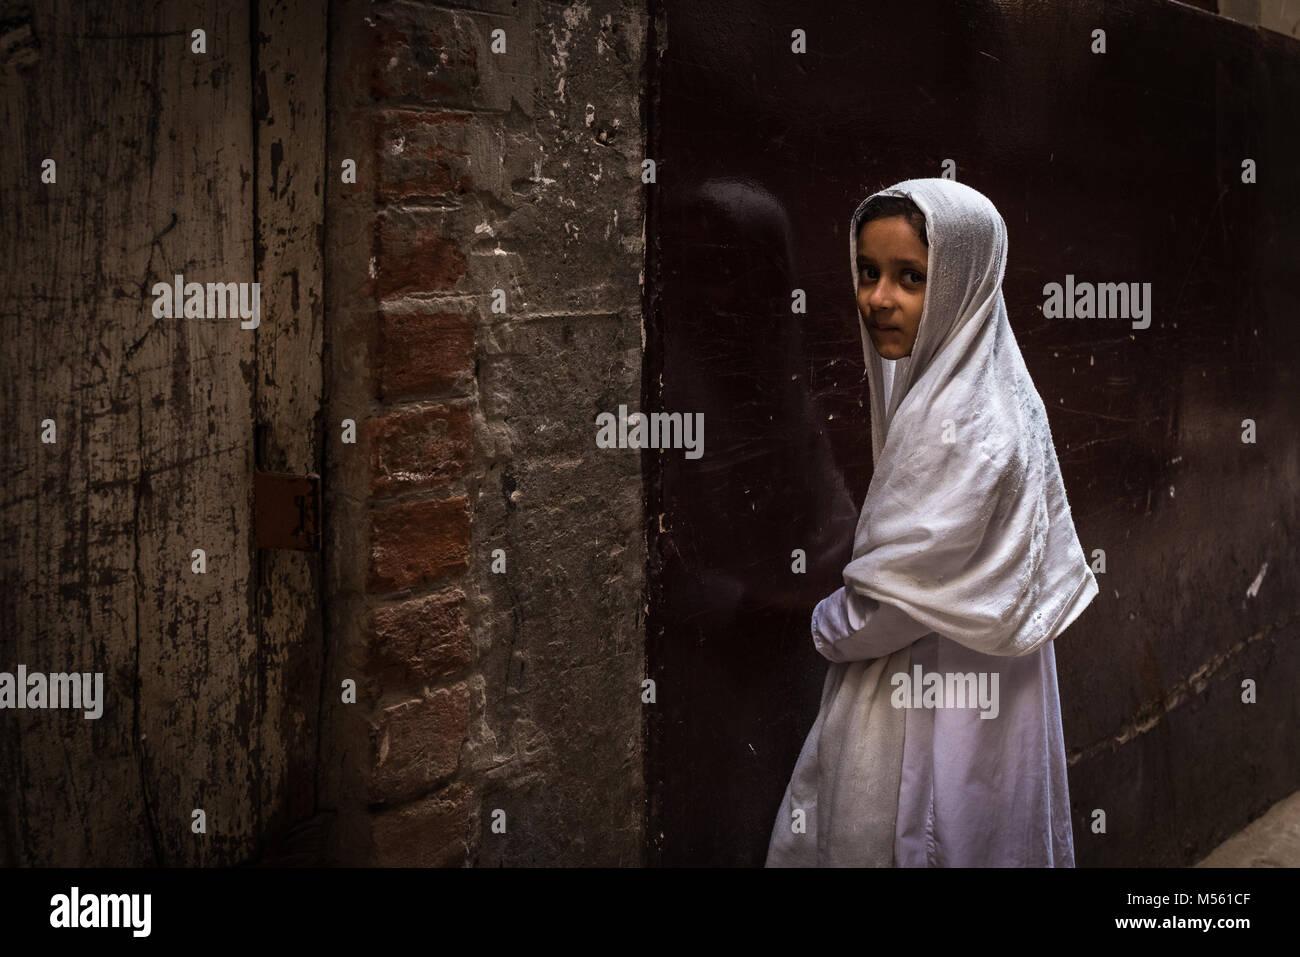 Timide jeune fille musulmane debout dans une ruelle varanasi inde photo stock